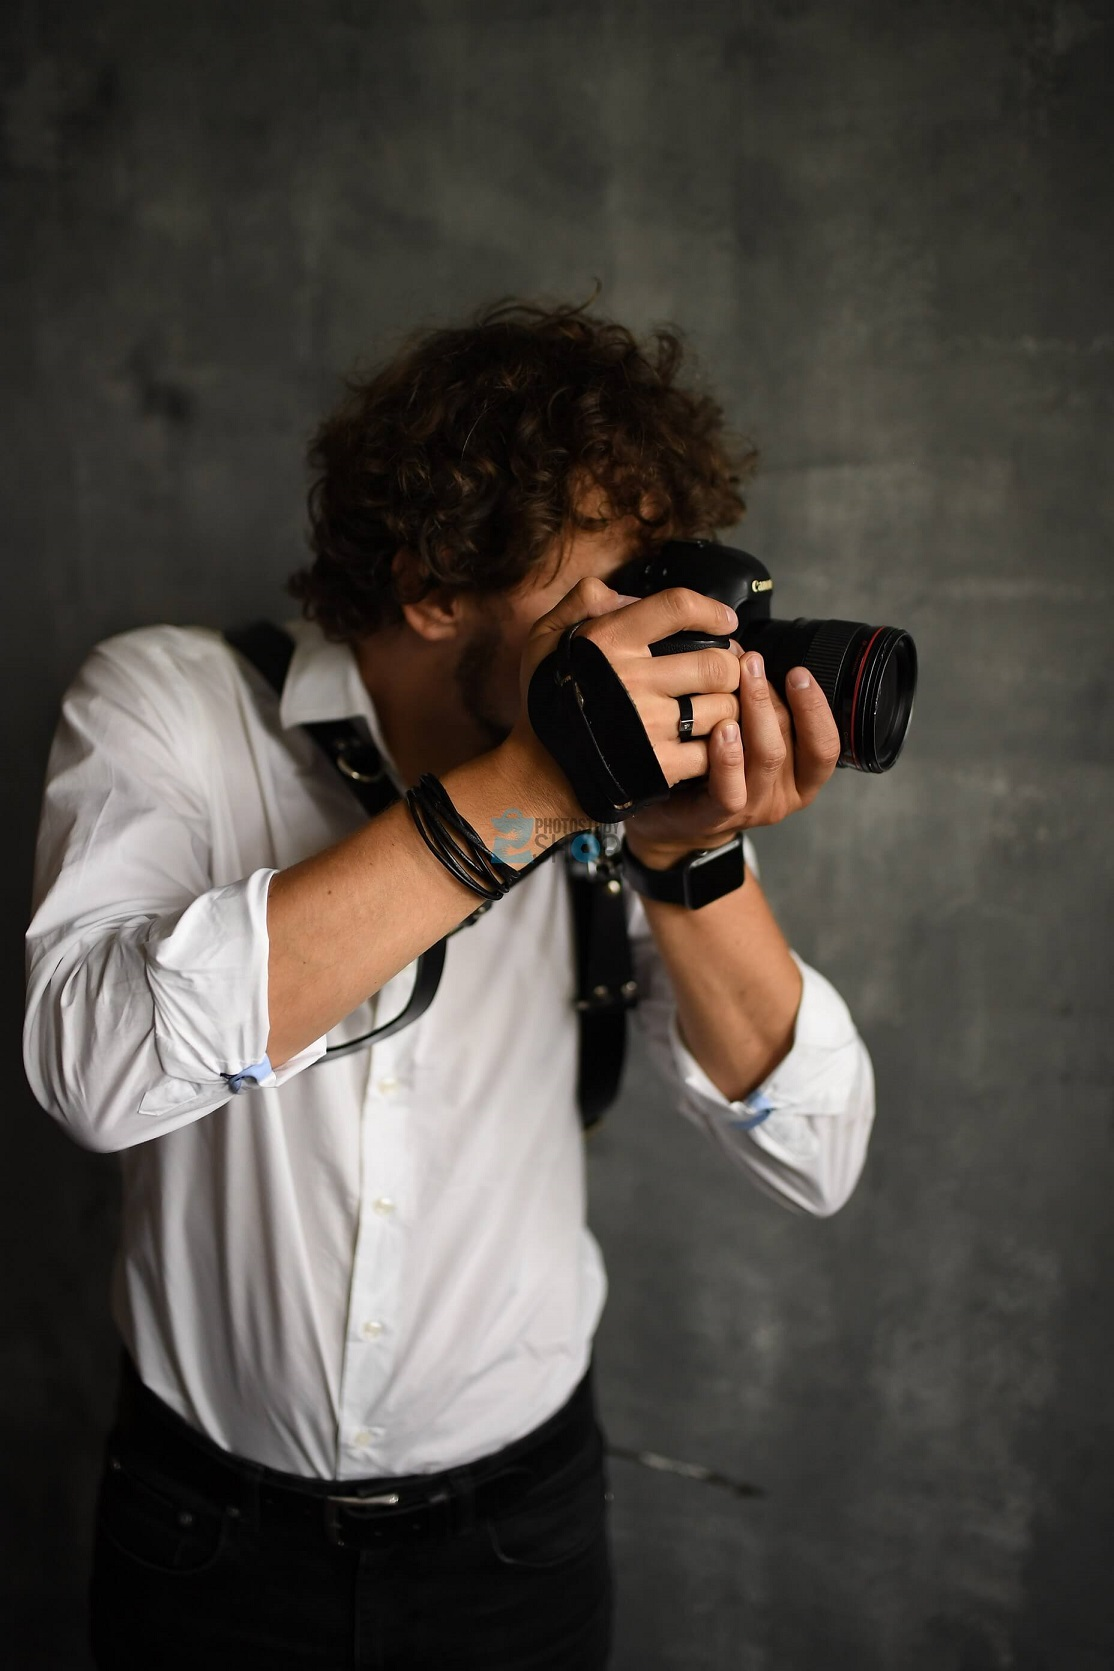 razgruzki_for_photographers005